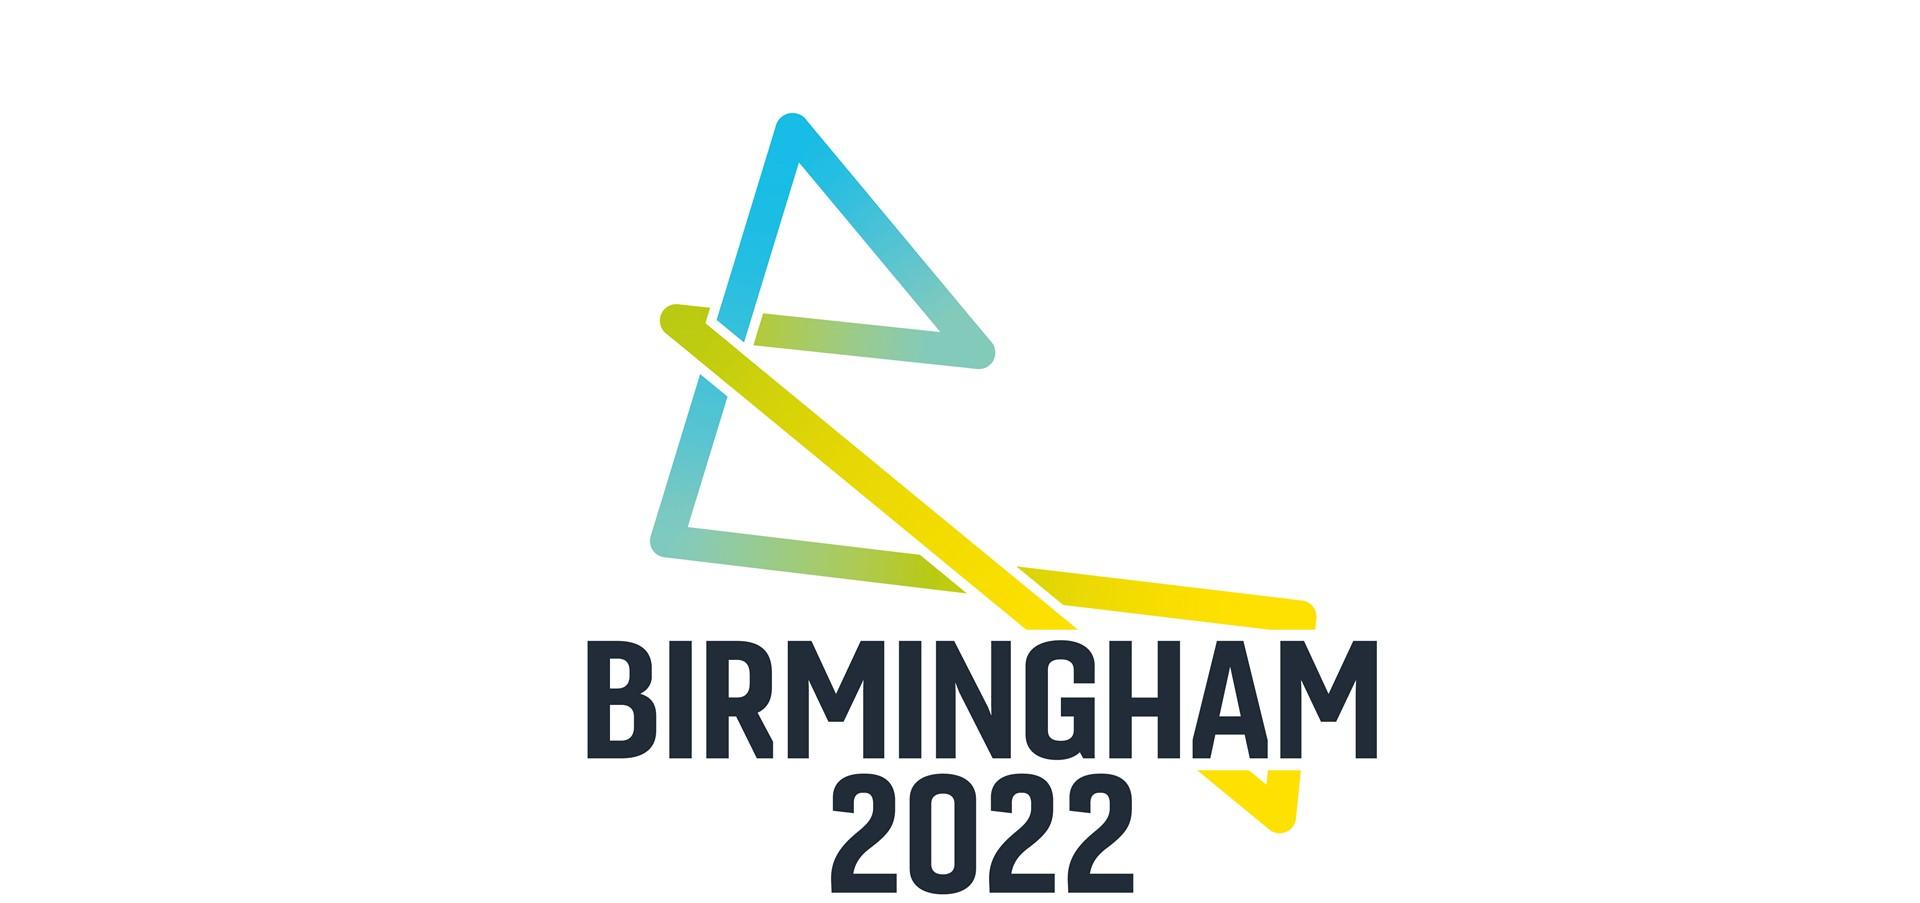 BIRMINGHAM 2022 CELEBRATES THREE-YEAR COUNTDOWN TO 'THE GAME